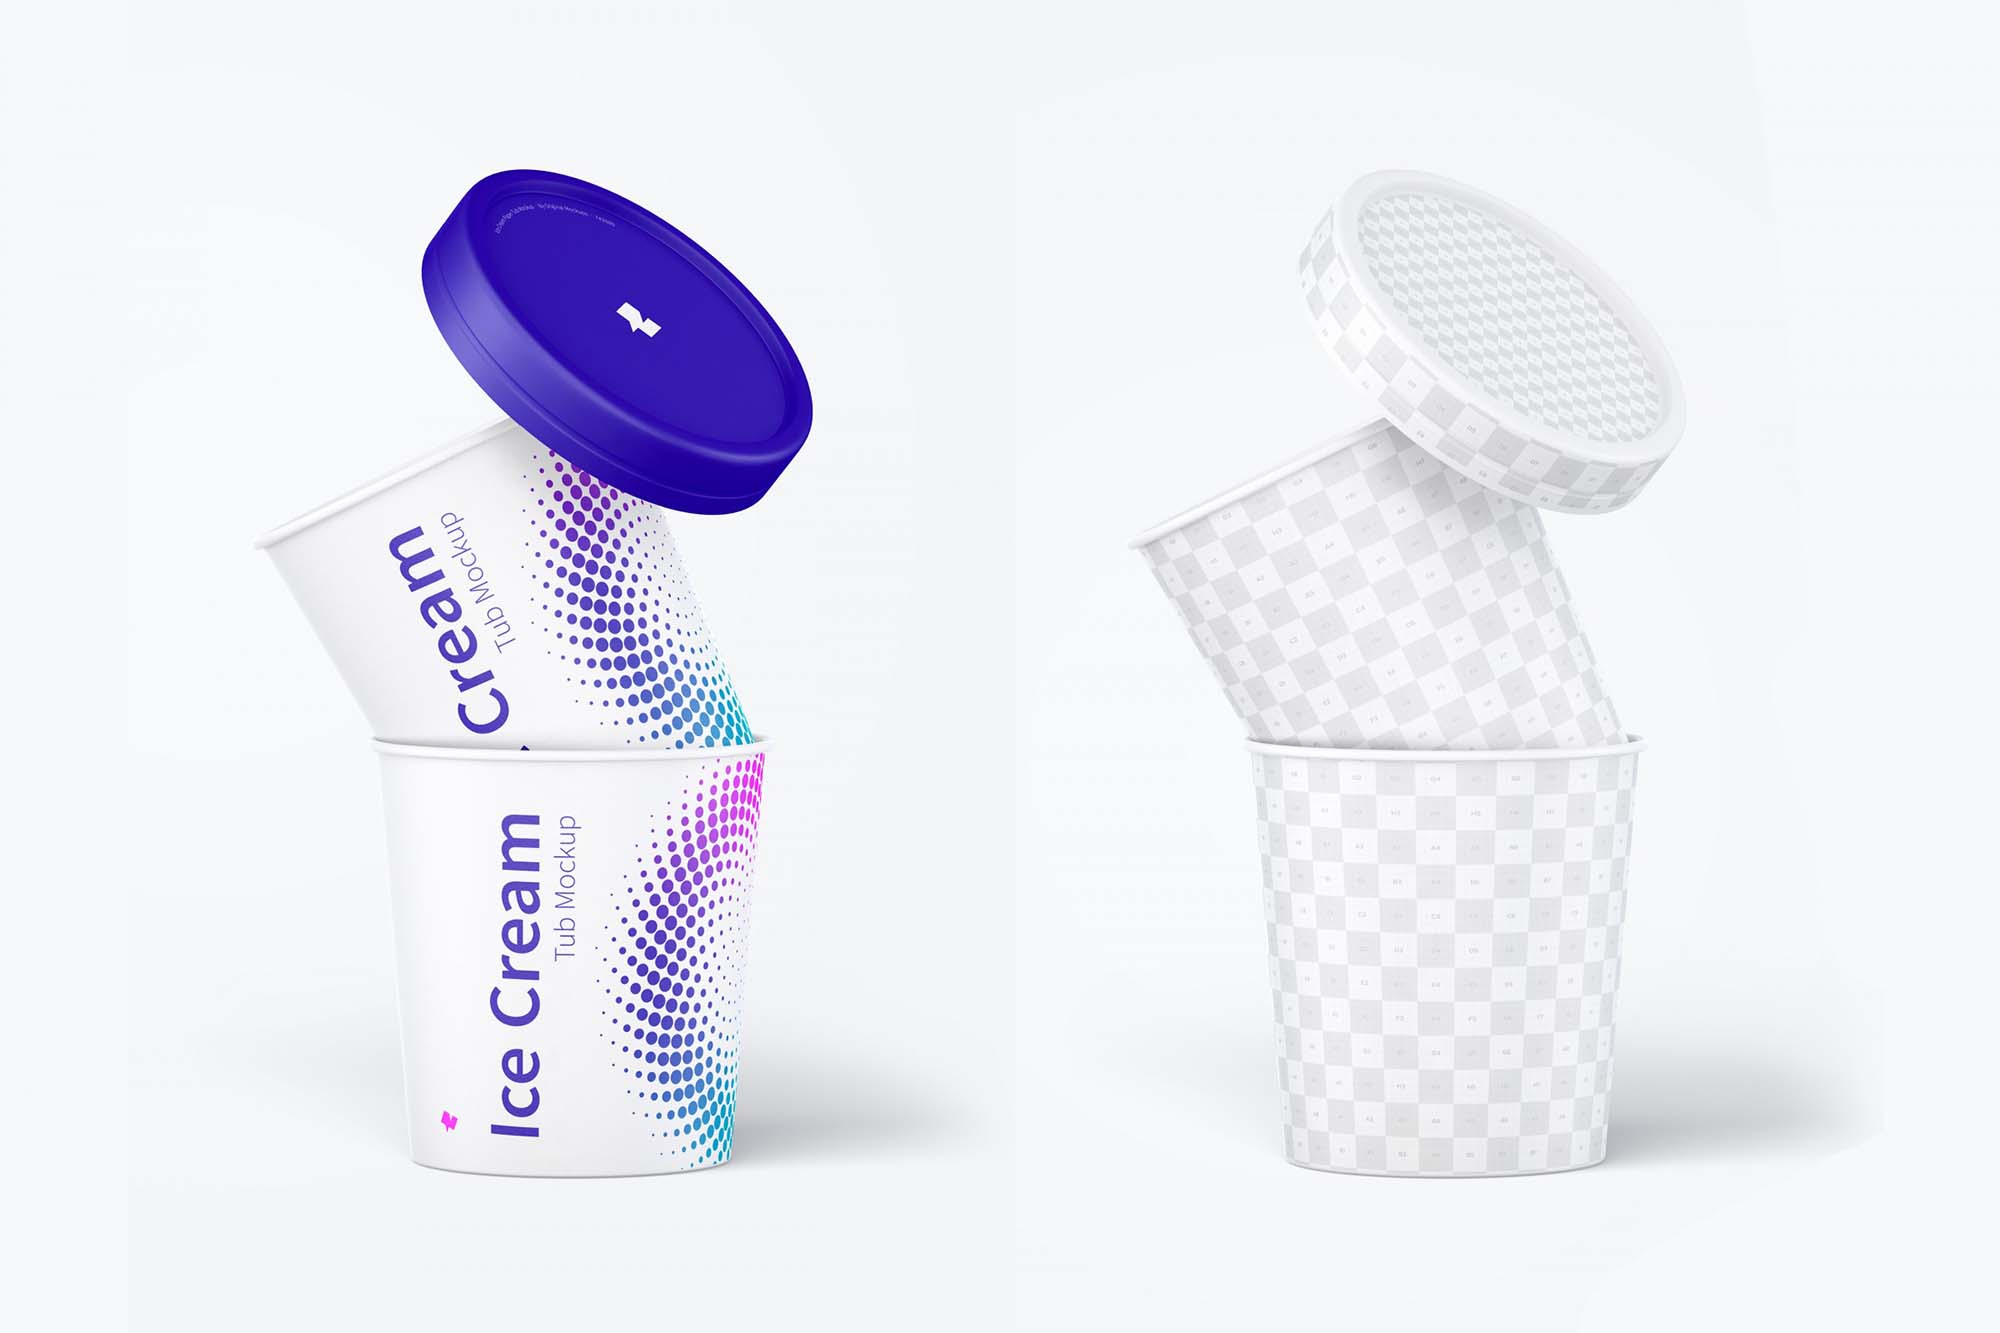 ce Cream Paper Tub Mockup 3